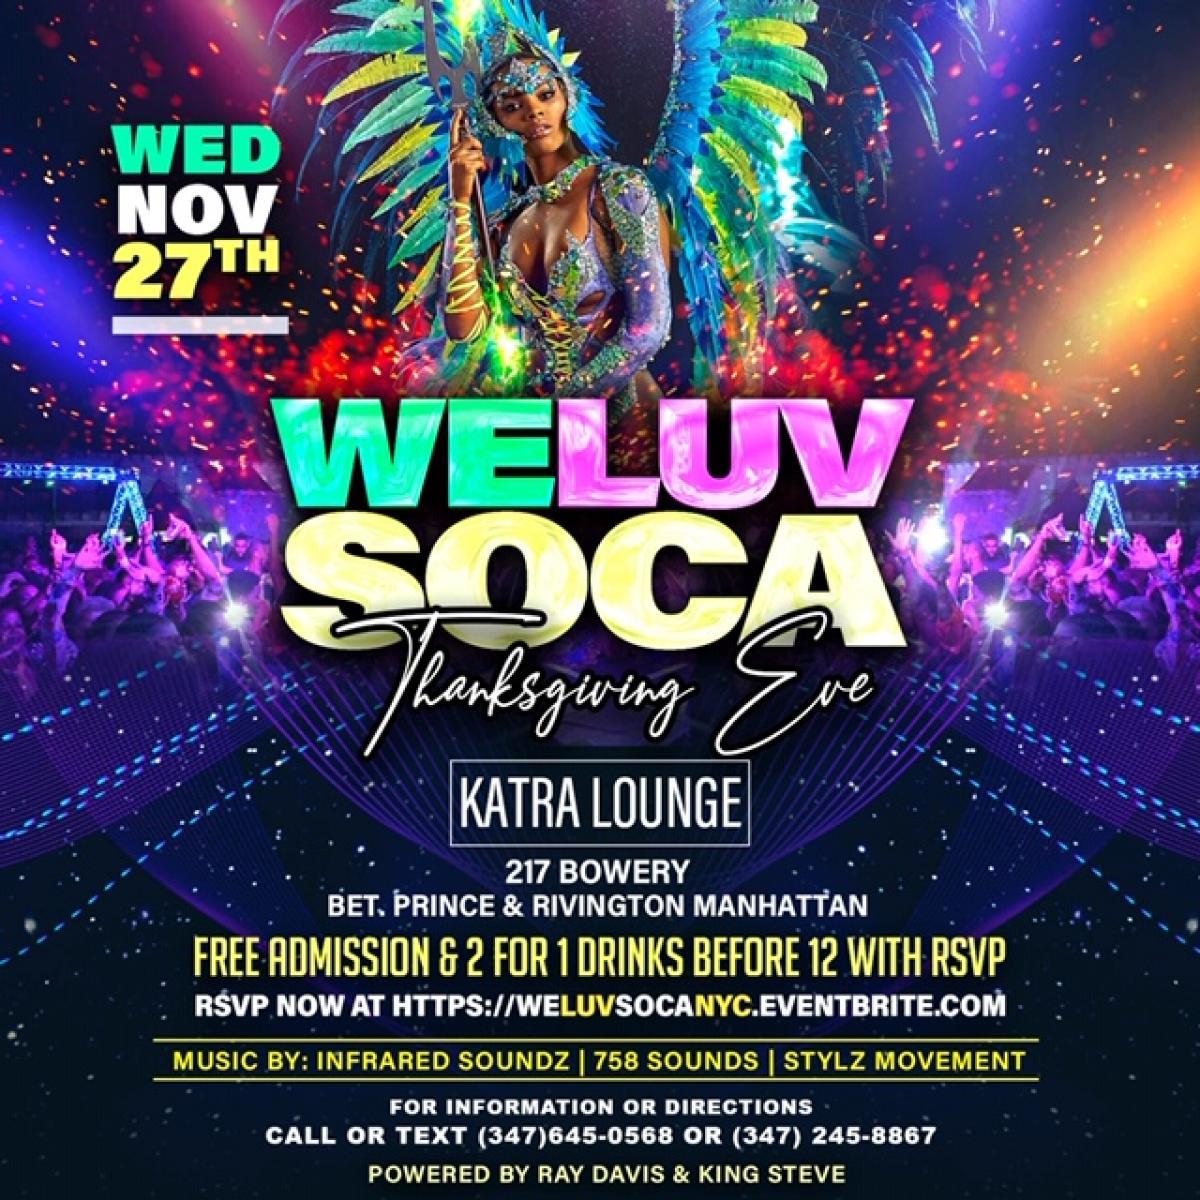 We Luv Soca flyer or graphic.